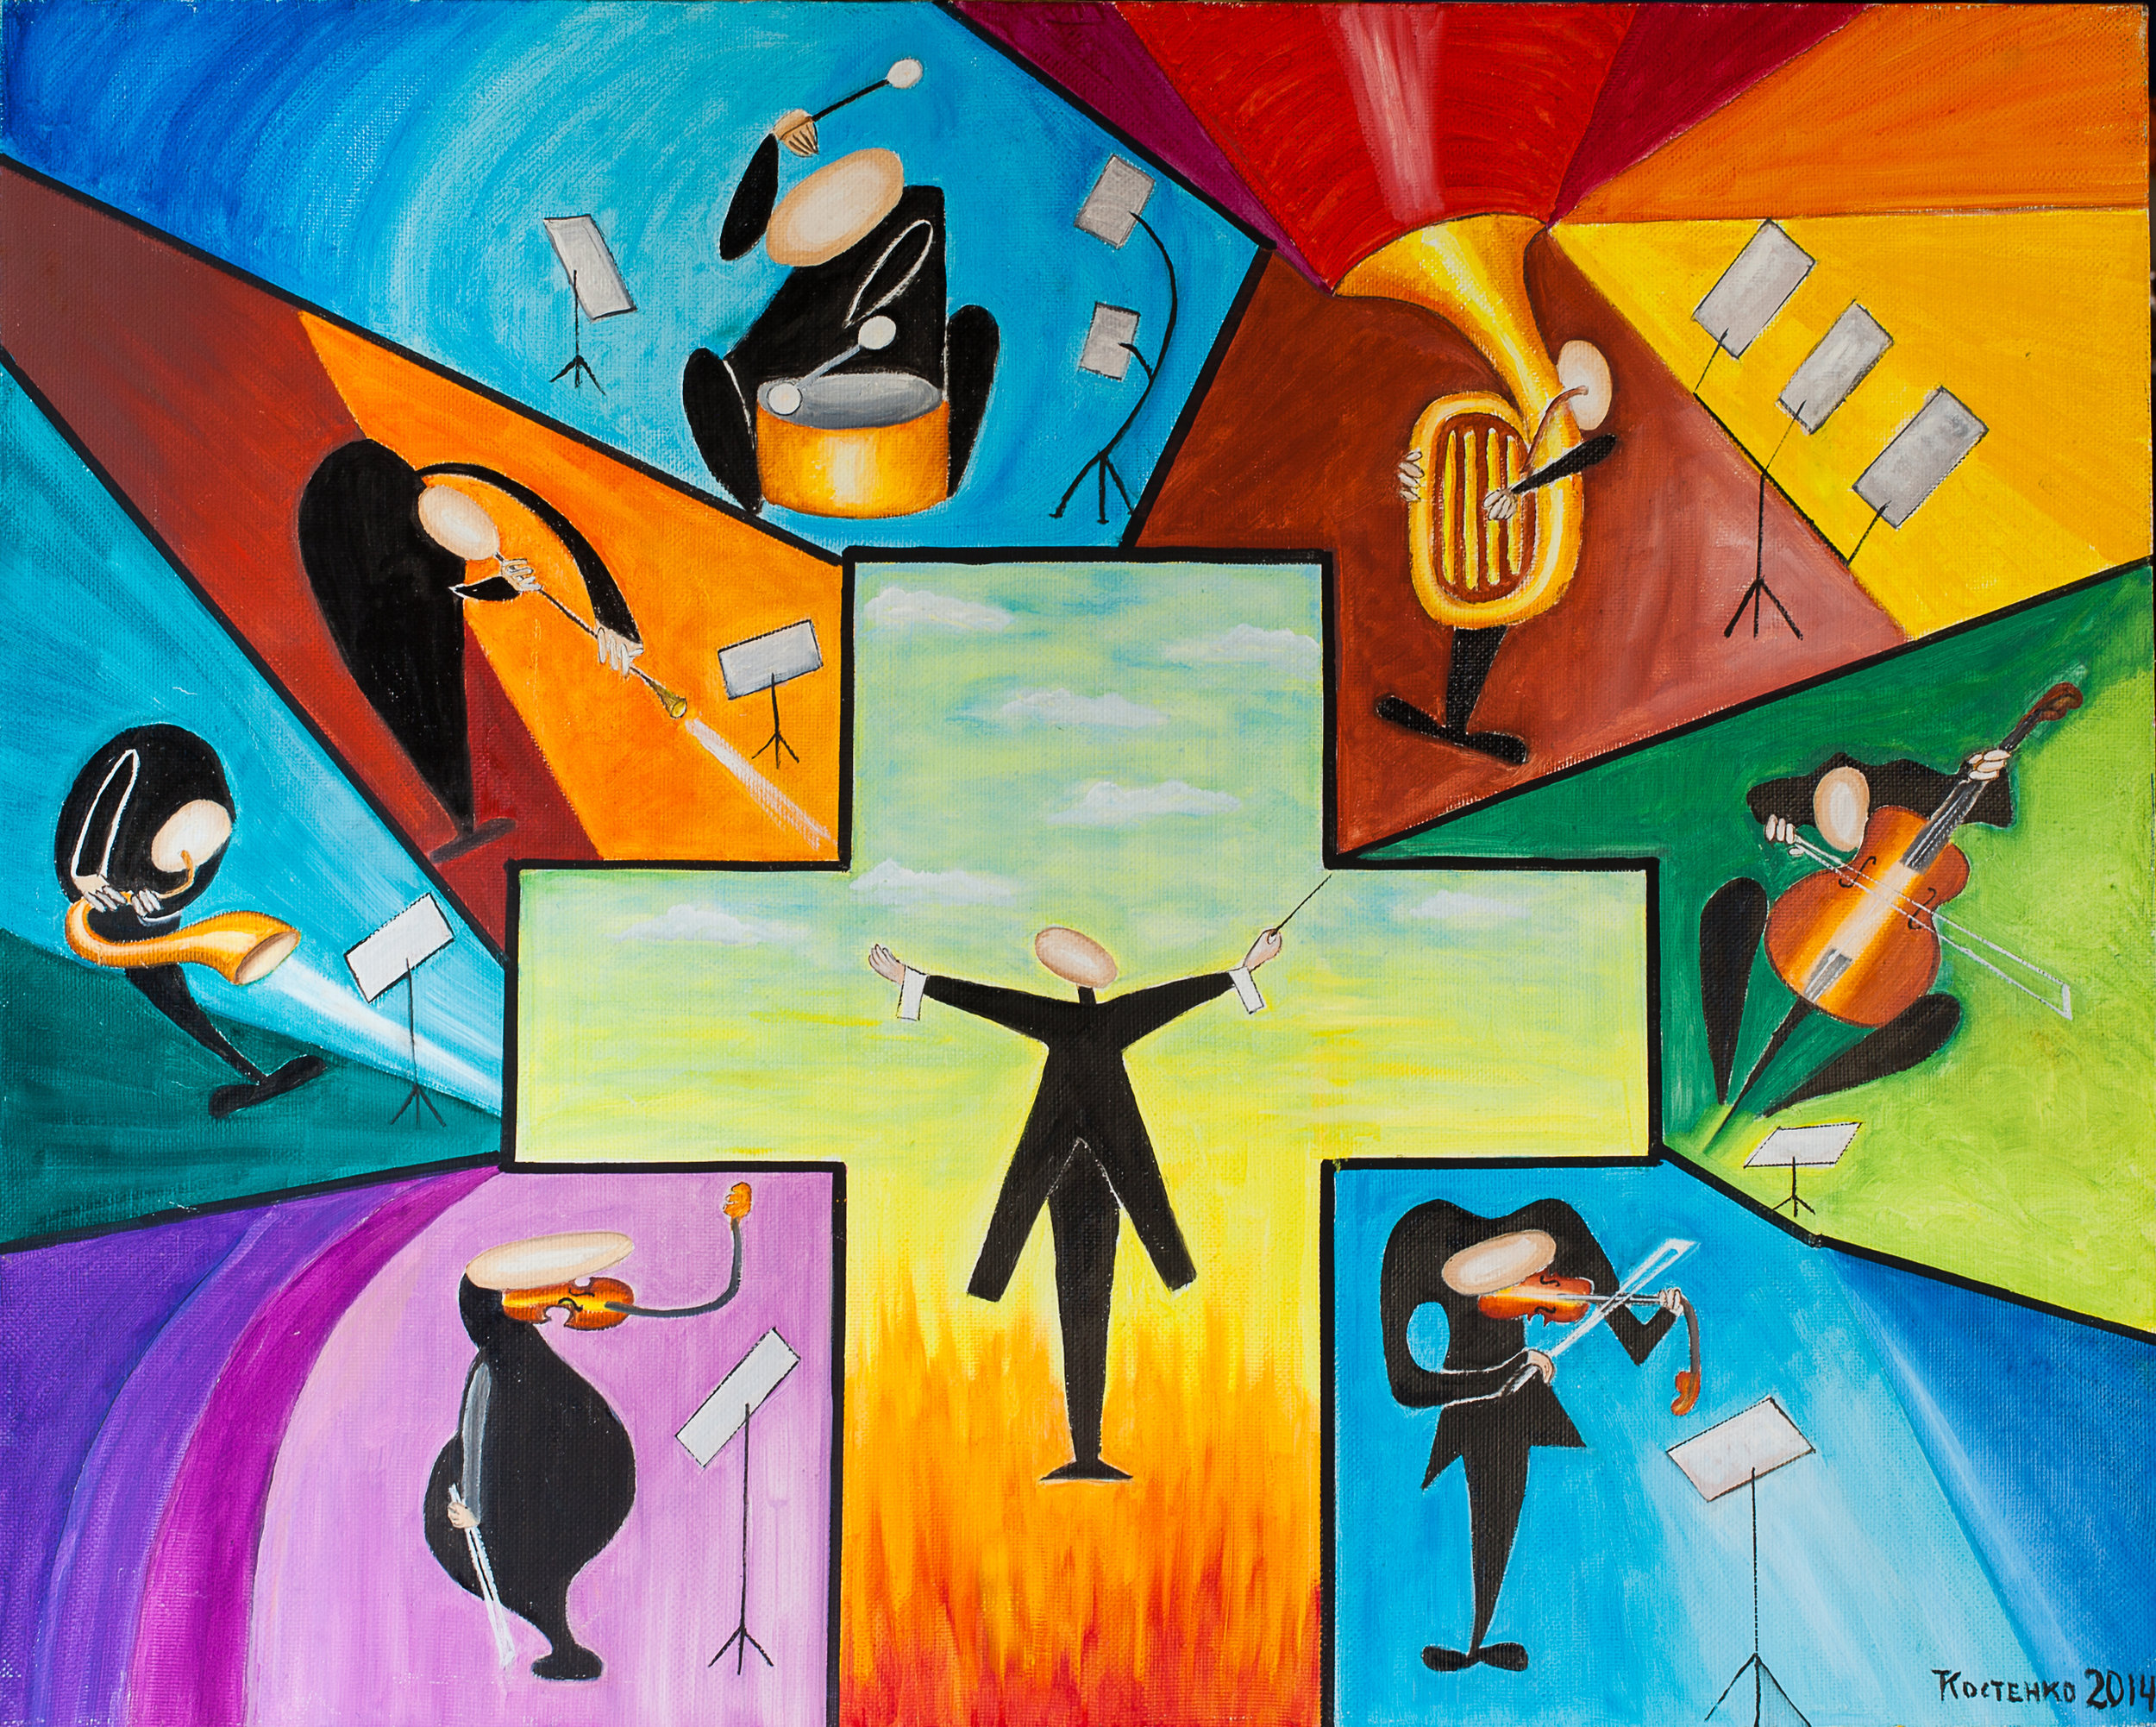 Kostenko - Concert - 2014-canvas-oil-80х100 - inbook.jpg